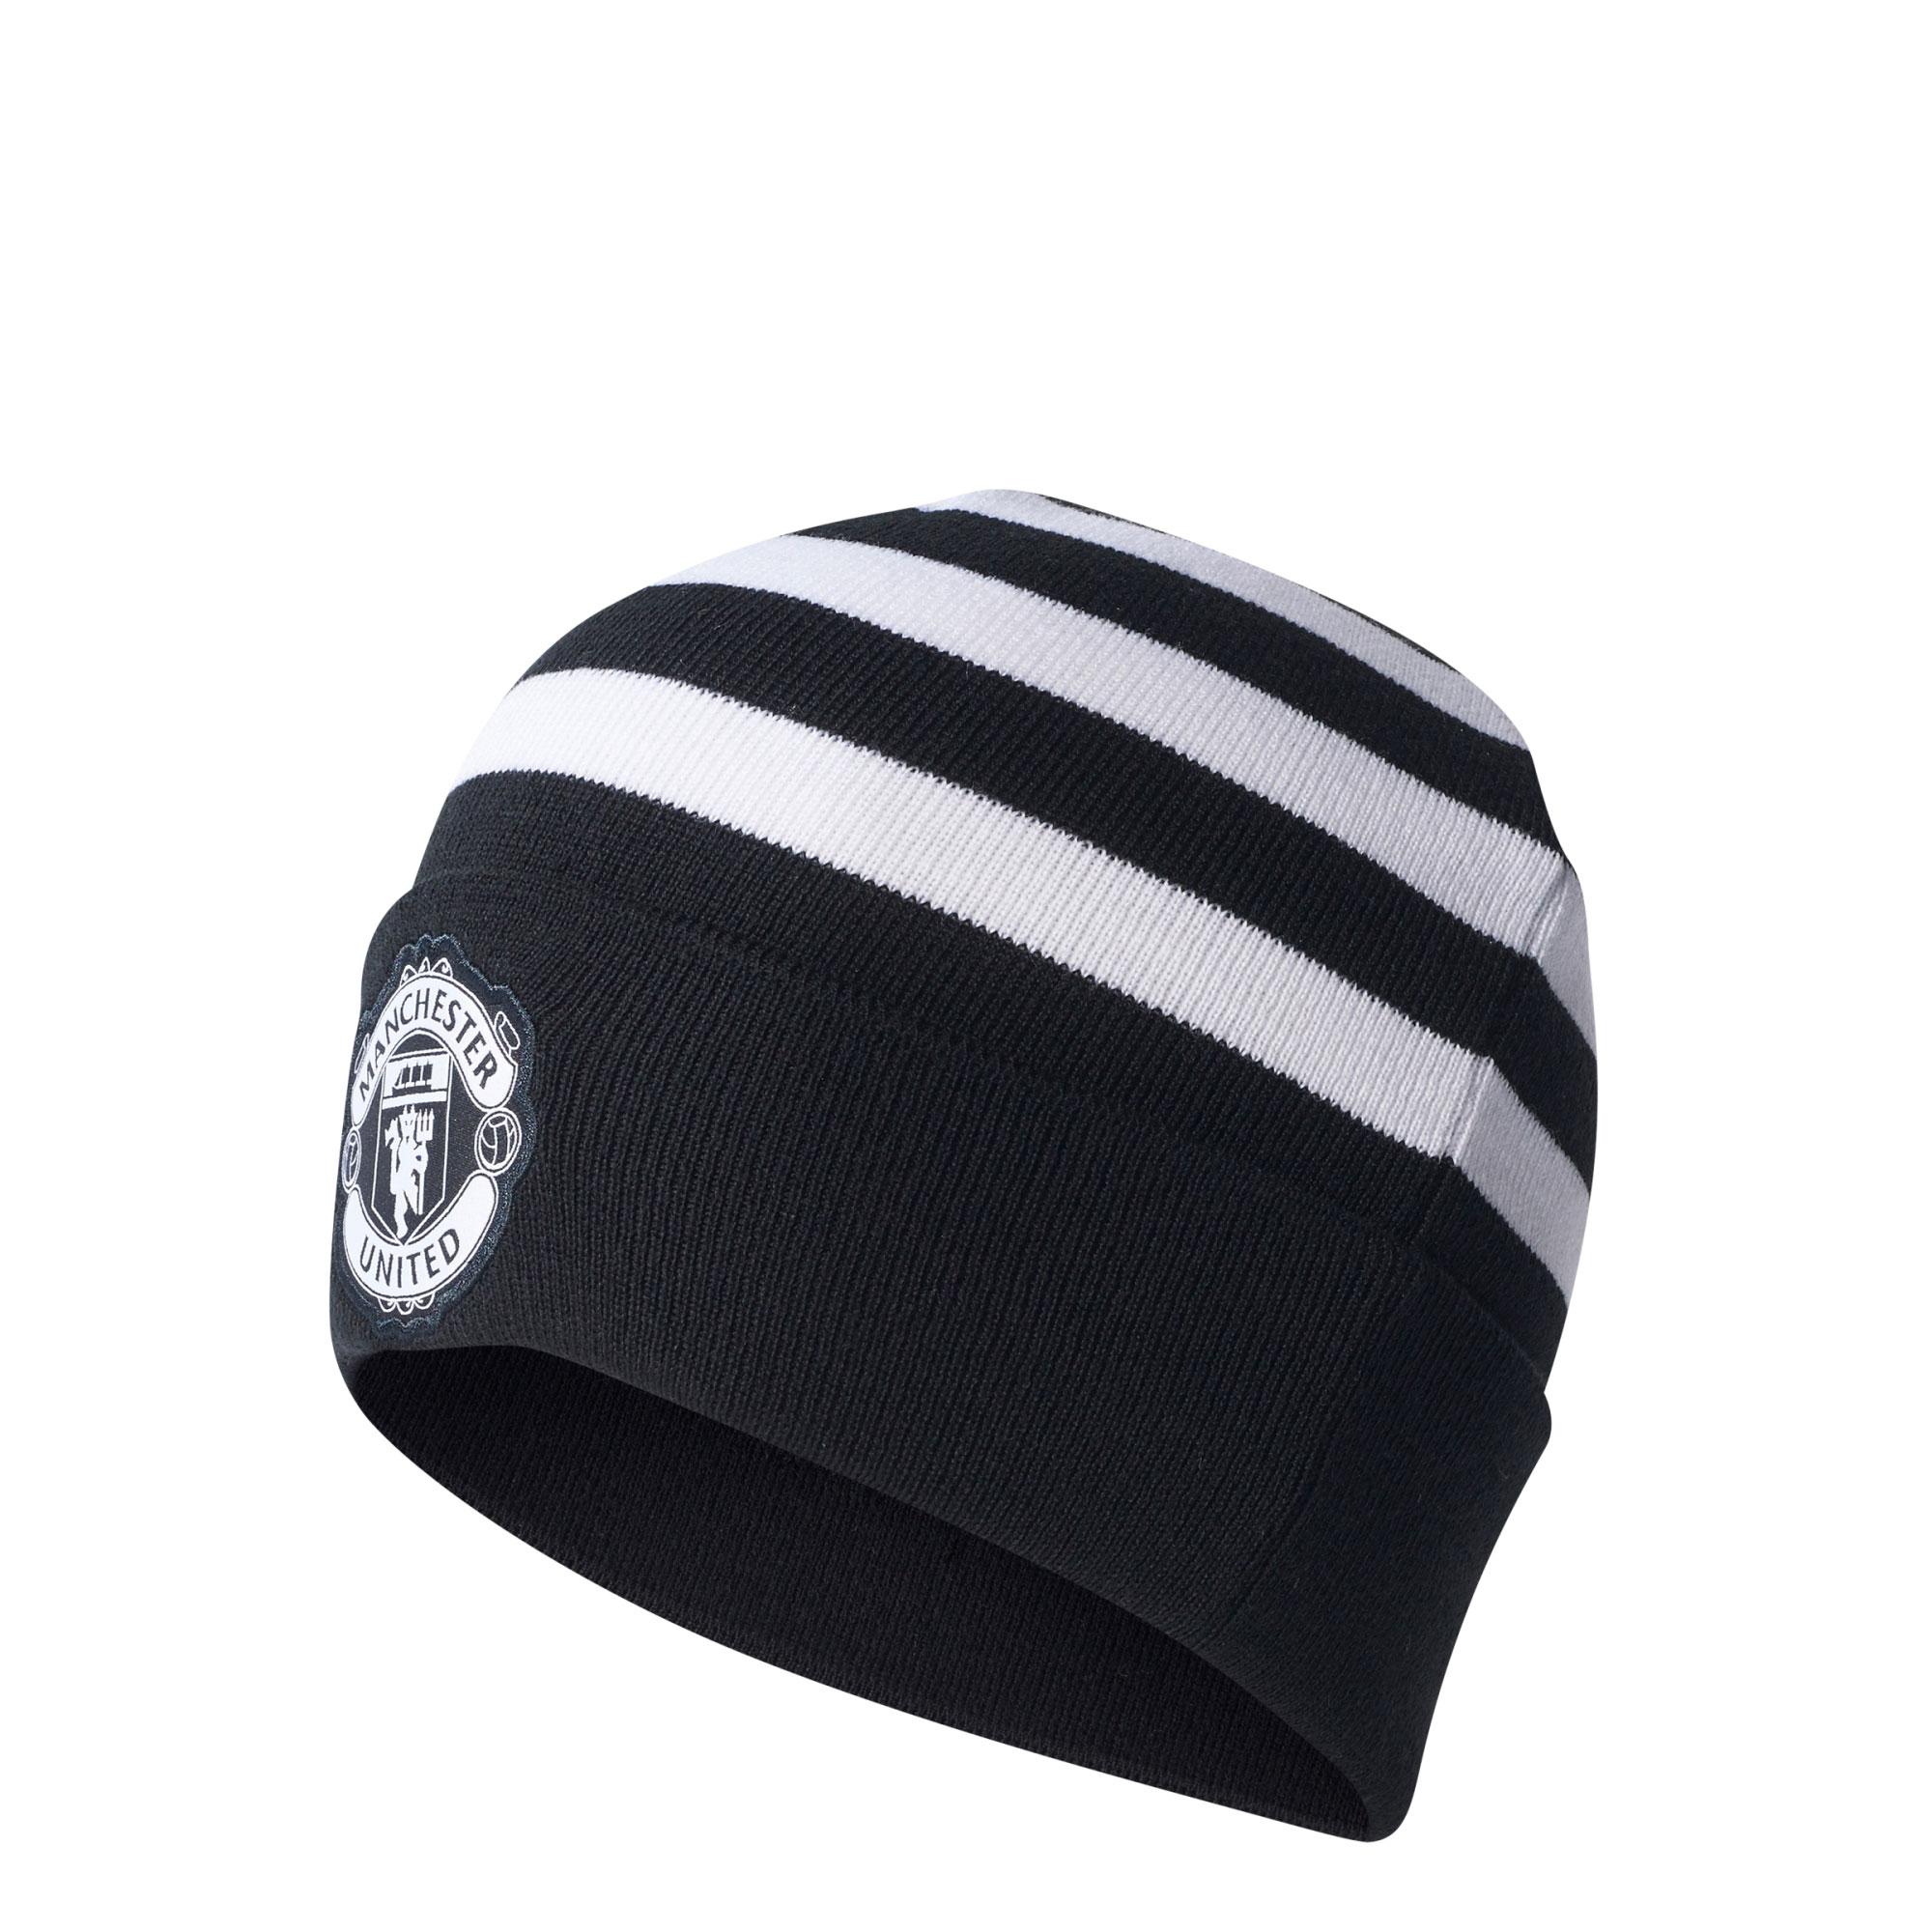 Manchester United 3 Stripe Woolie - Black - White